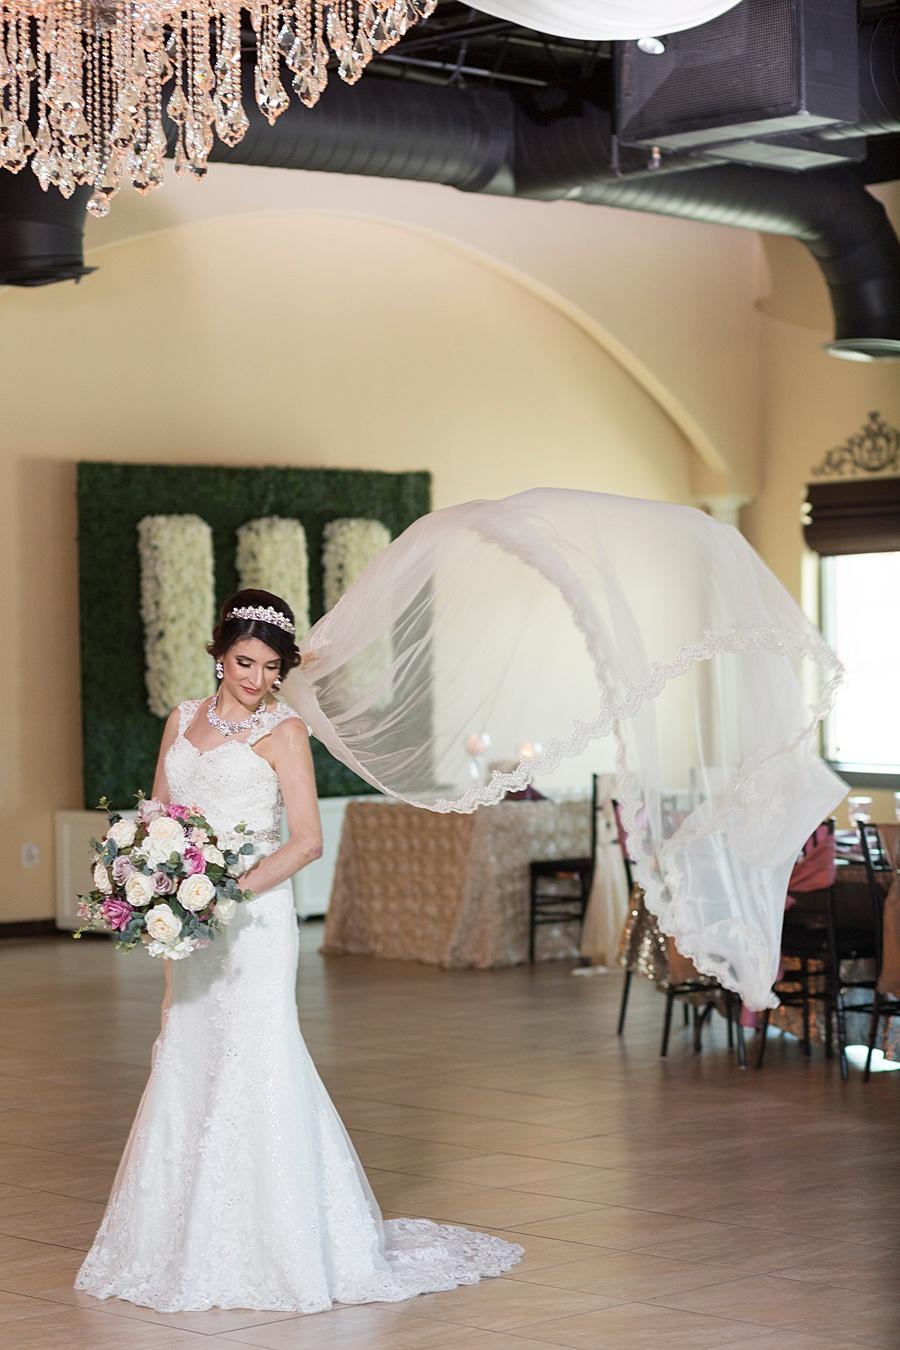 Stacy Anderson Photography Baytown LaPorte Wedding Photographer_0012.jpg